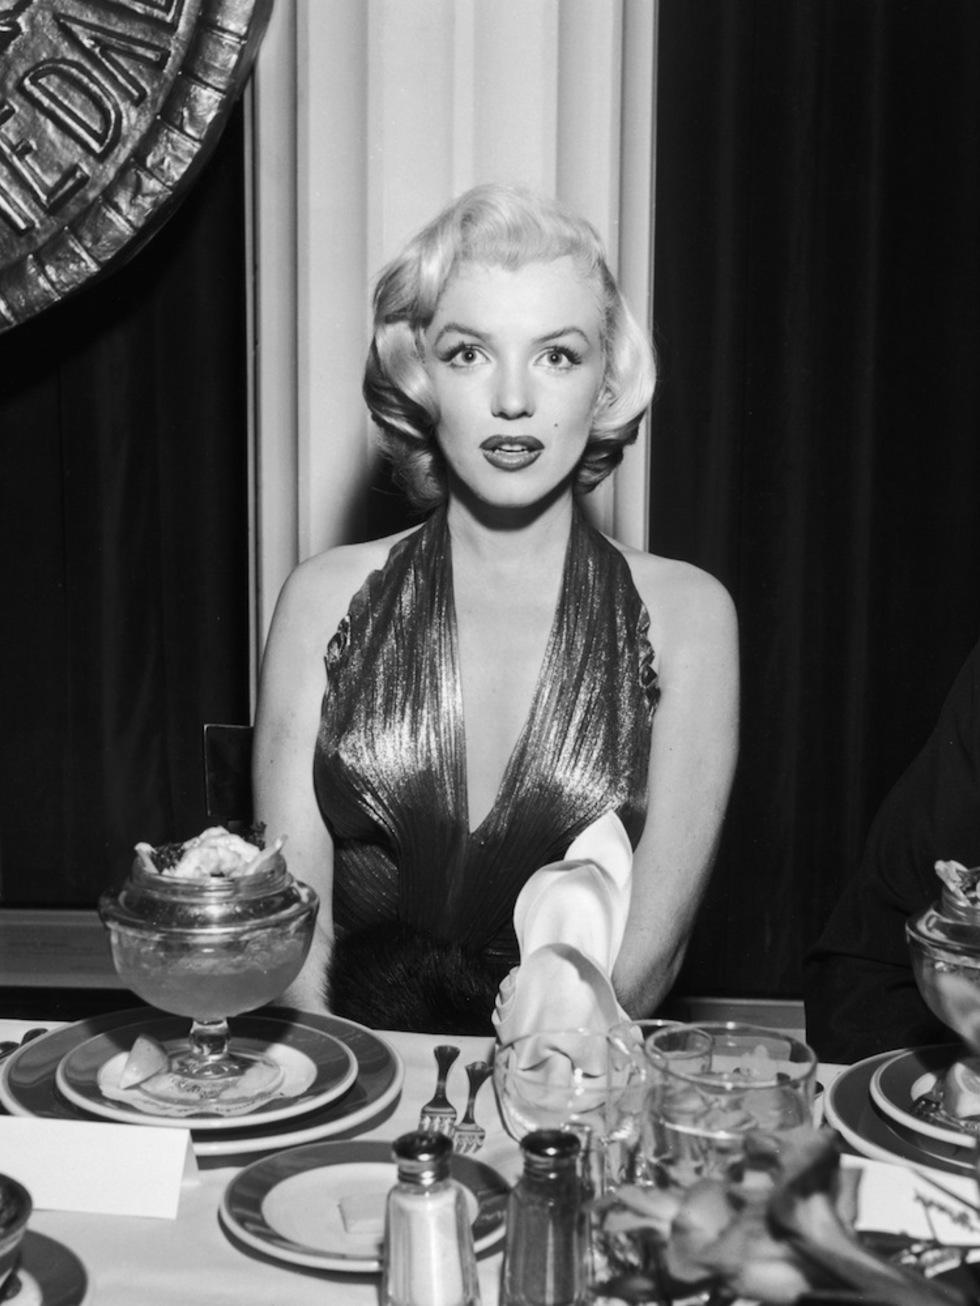 Bien connu 16 Beautiful Photos Of Marilyn Monroe GH11